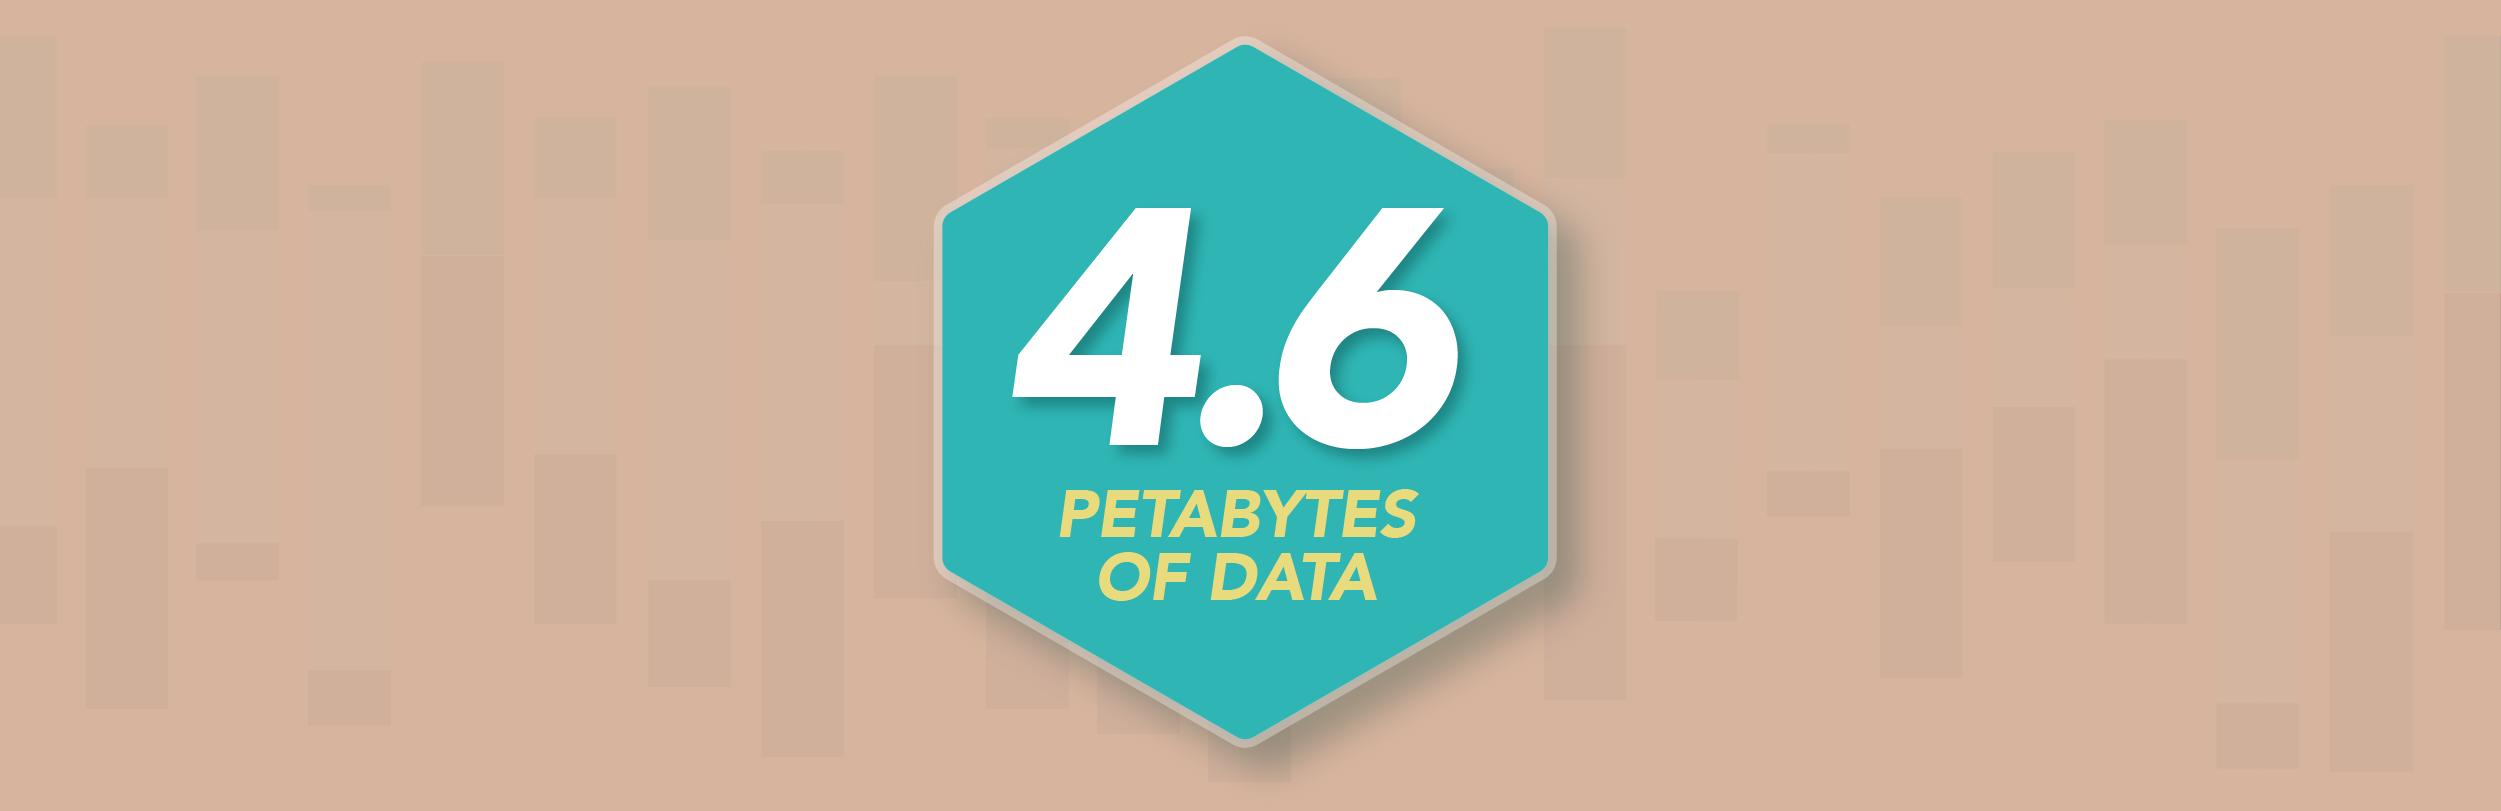 4.6 petabytes of data